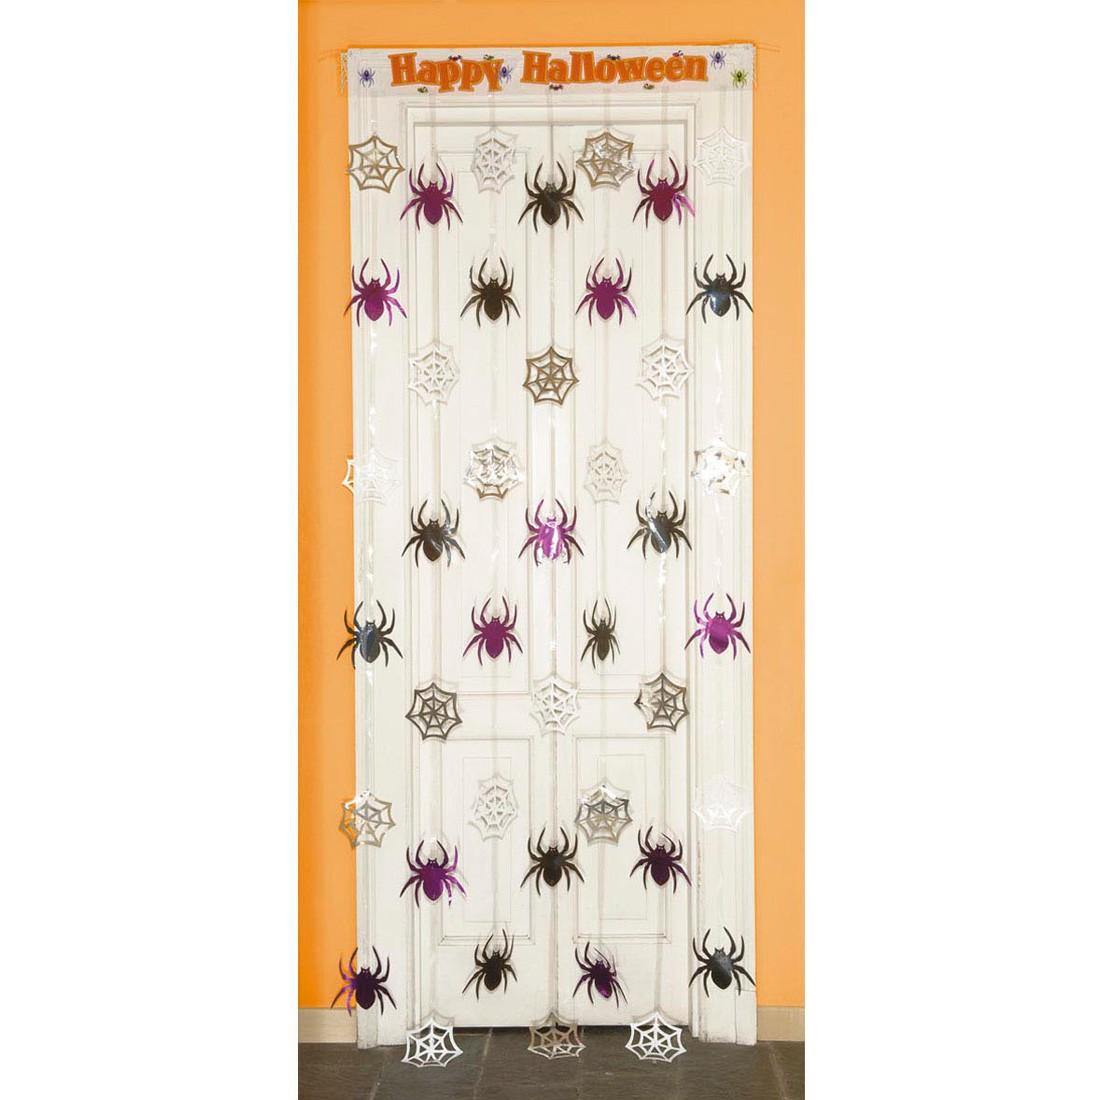 halloween deko t r vorhang spinnen 11 99. Black Bedroom Furniture Sets. Home Design Ideas